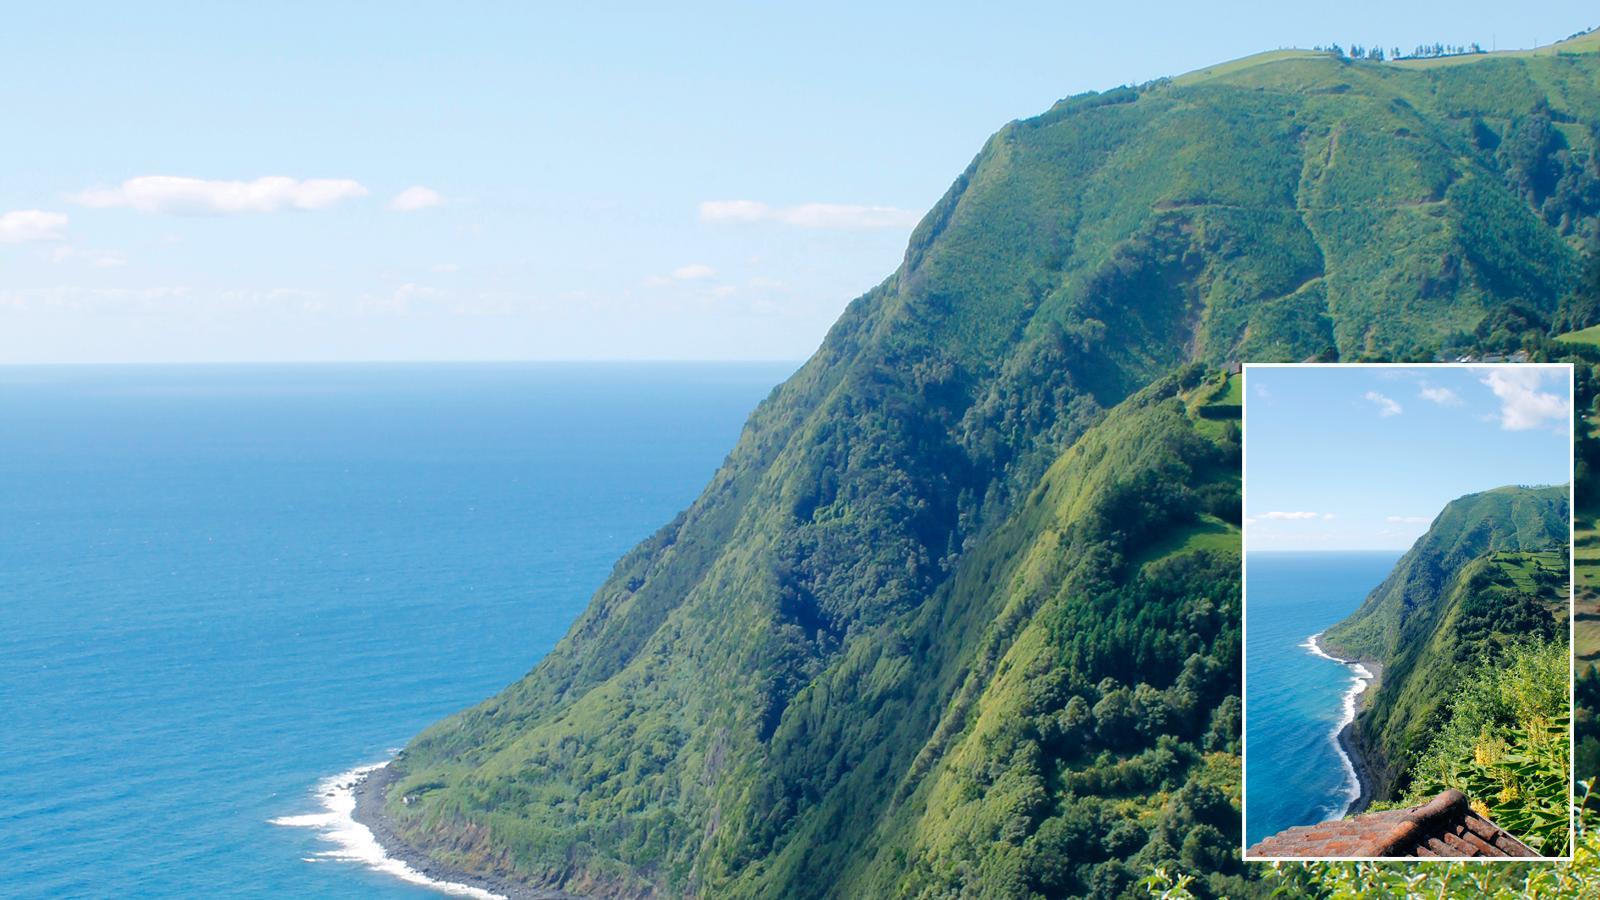 Miradouro na Ponta do Sossego na Ilha de Açores